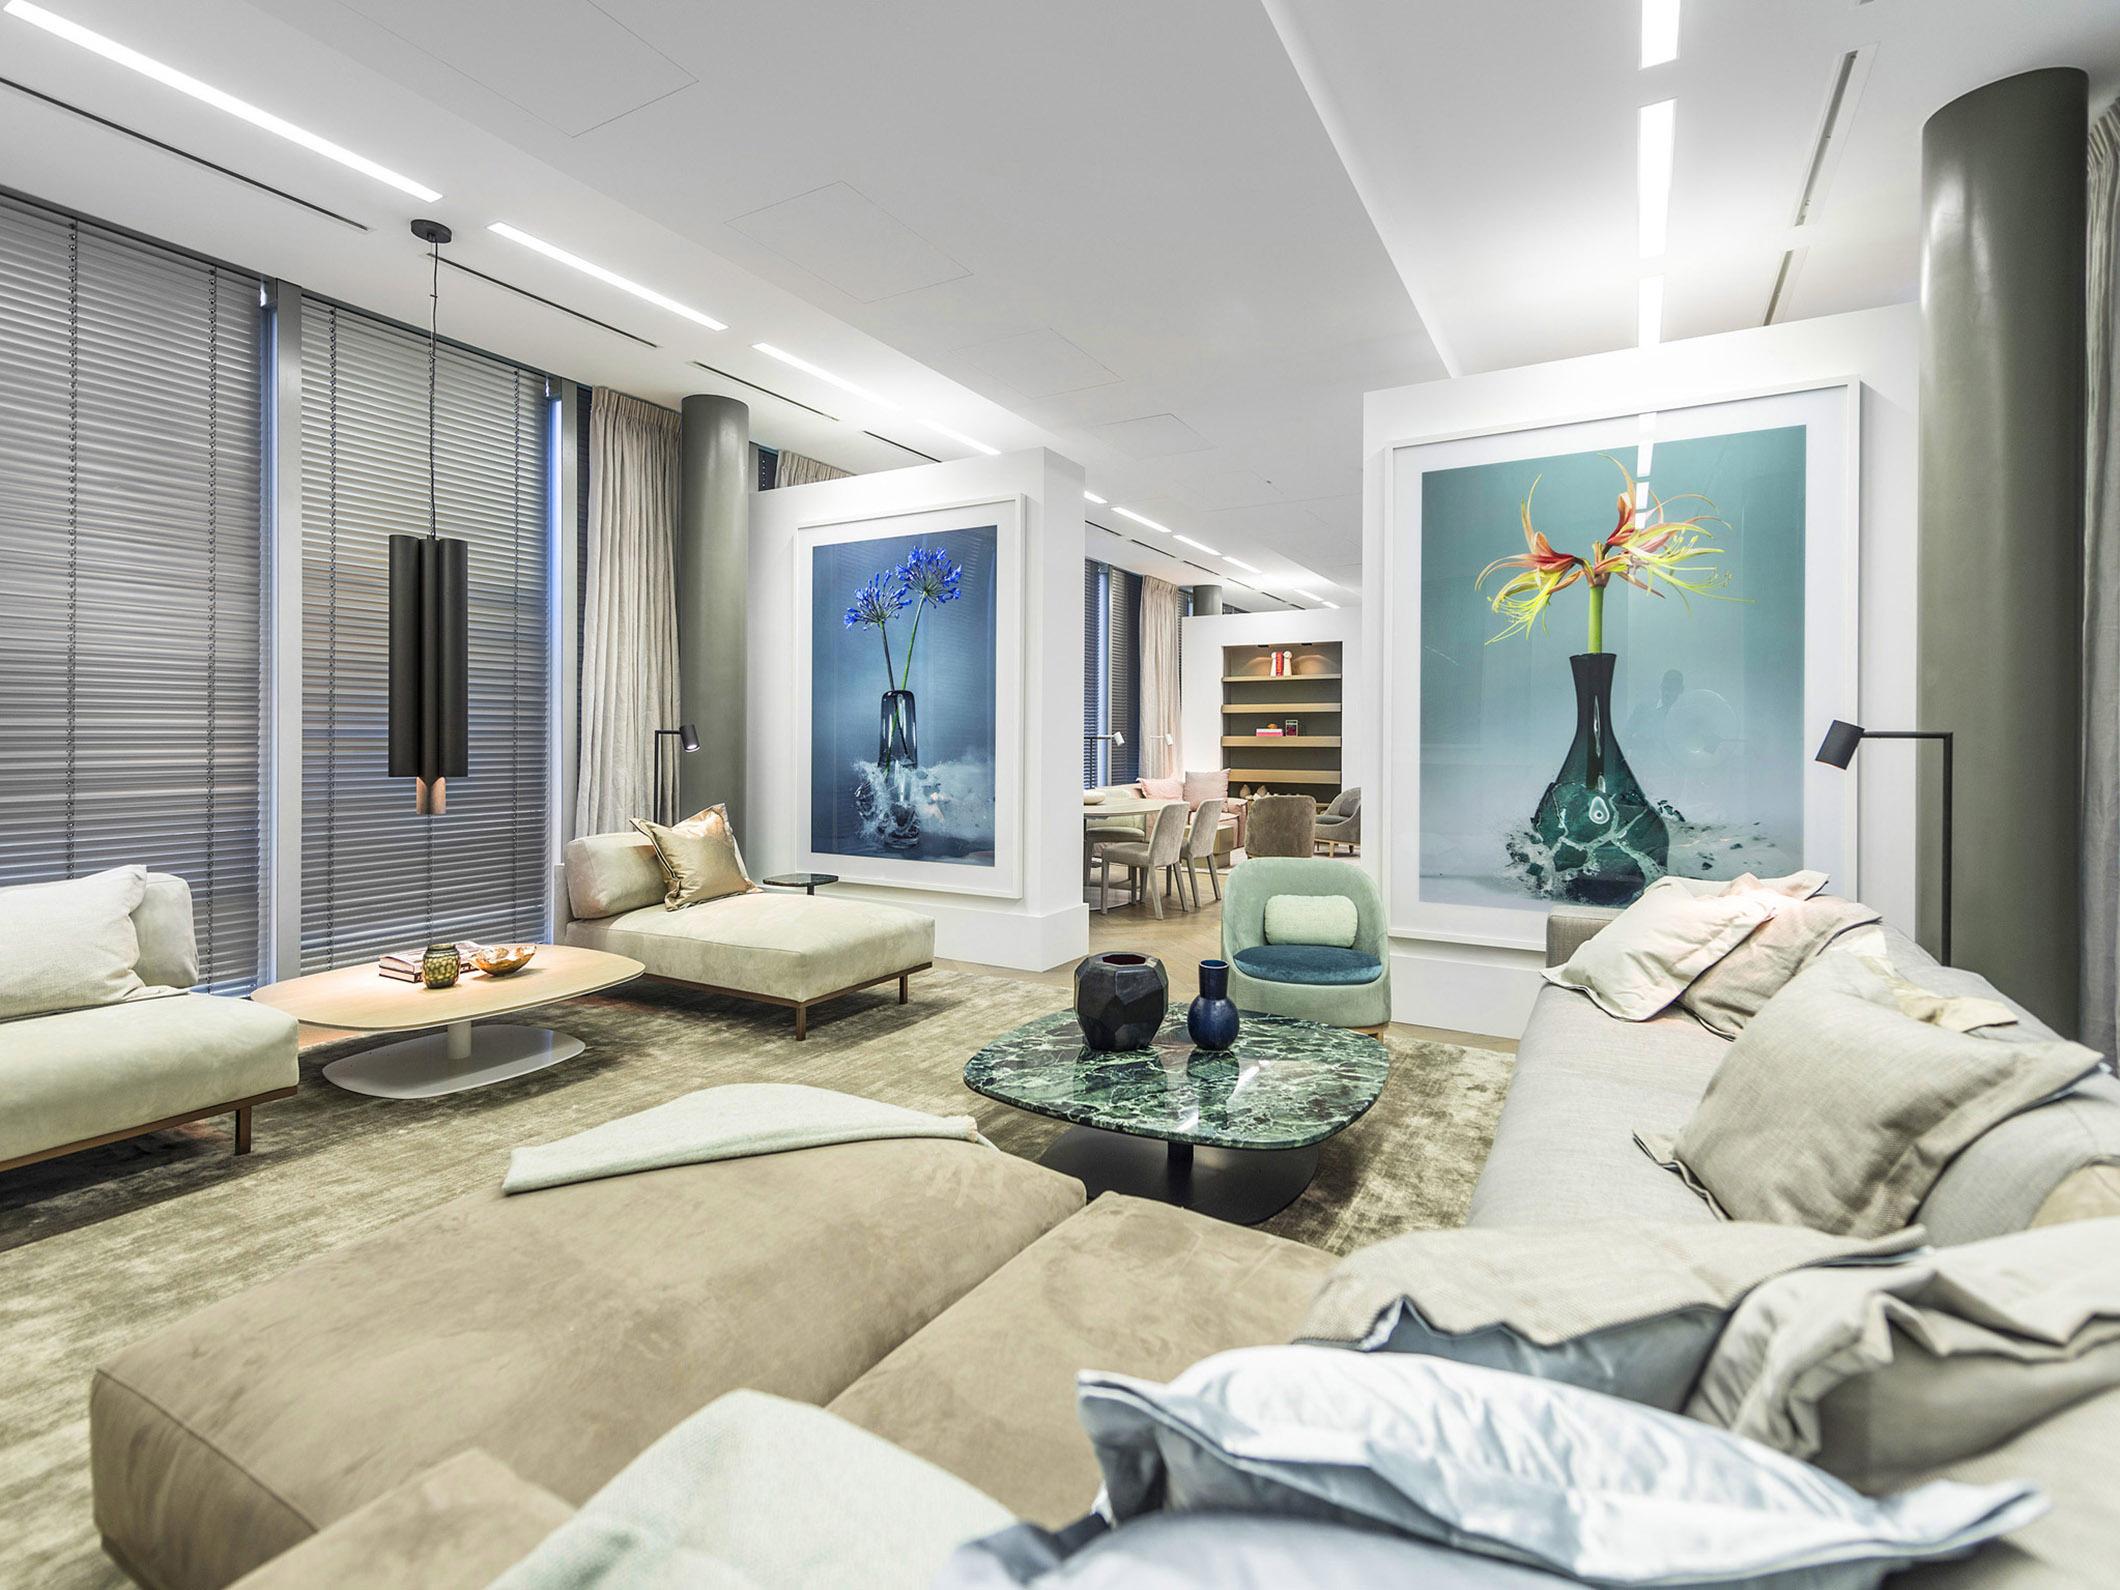 Cadman Düsseldorf concept store offices design projects studio piet boon